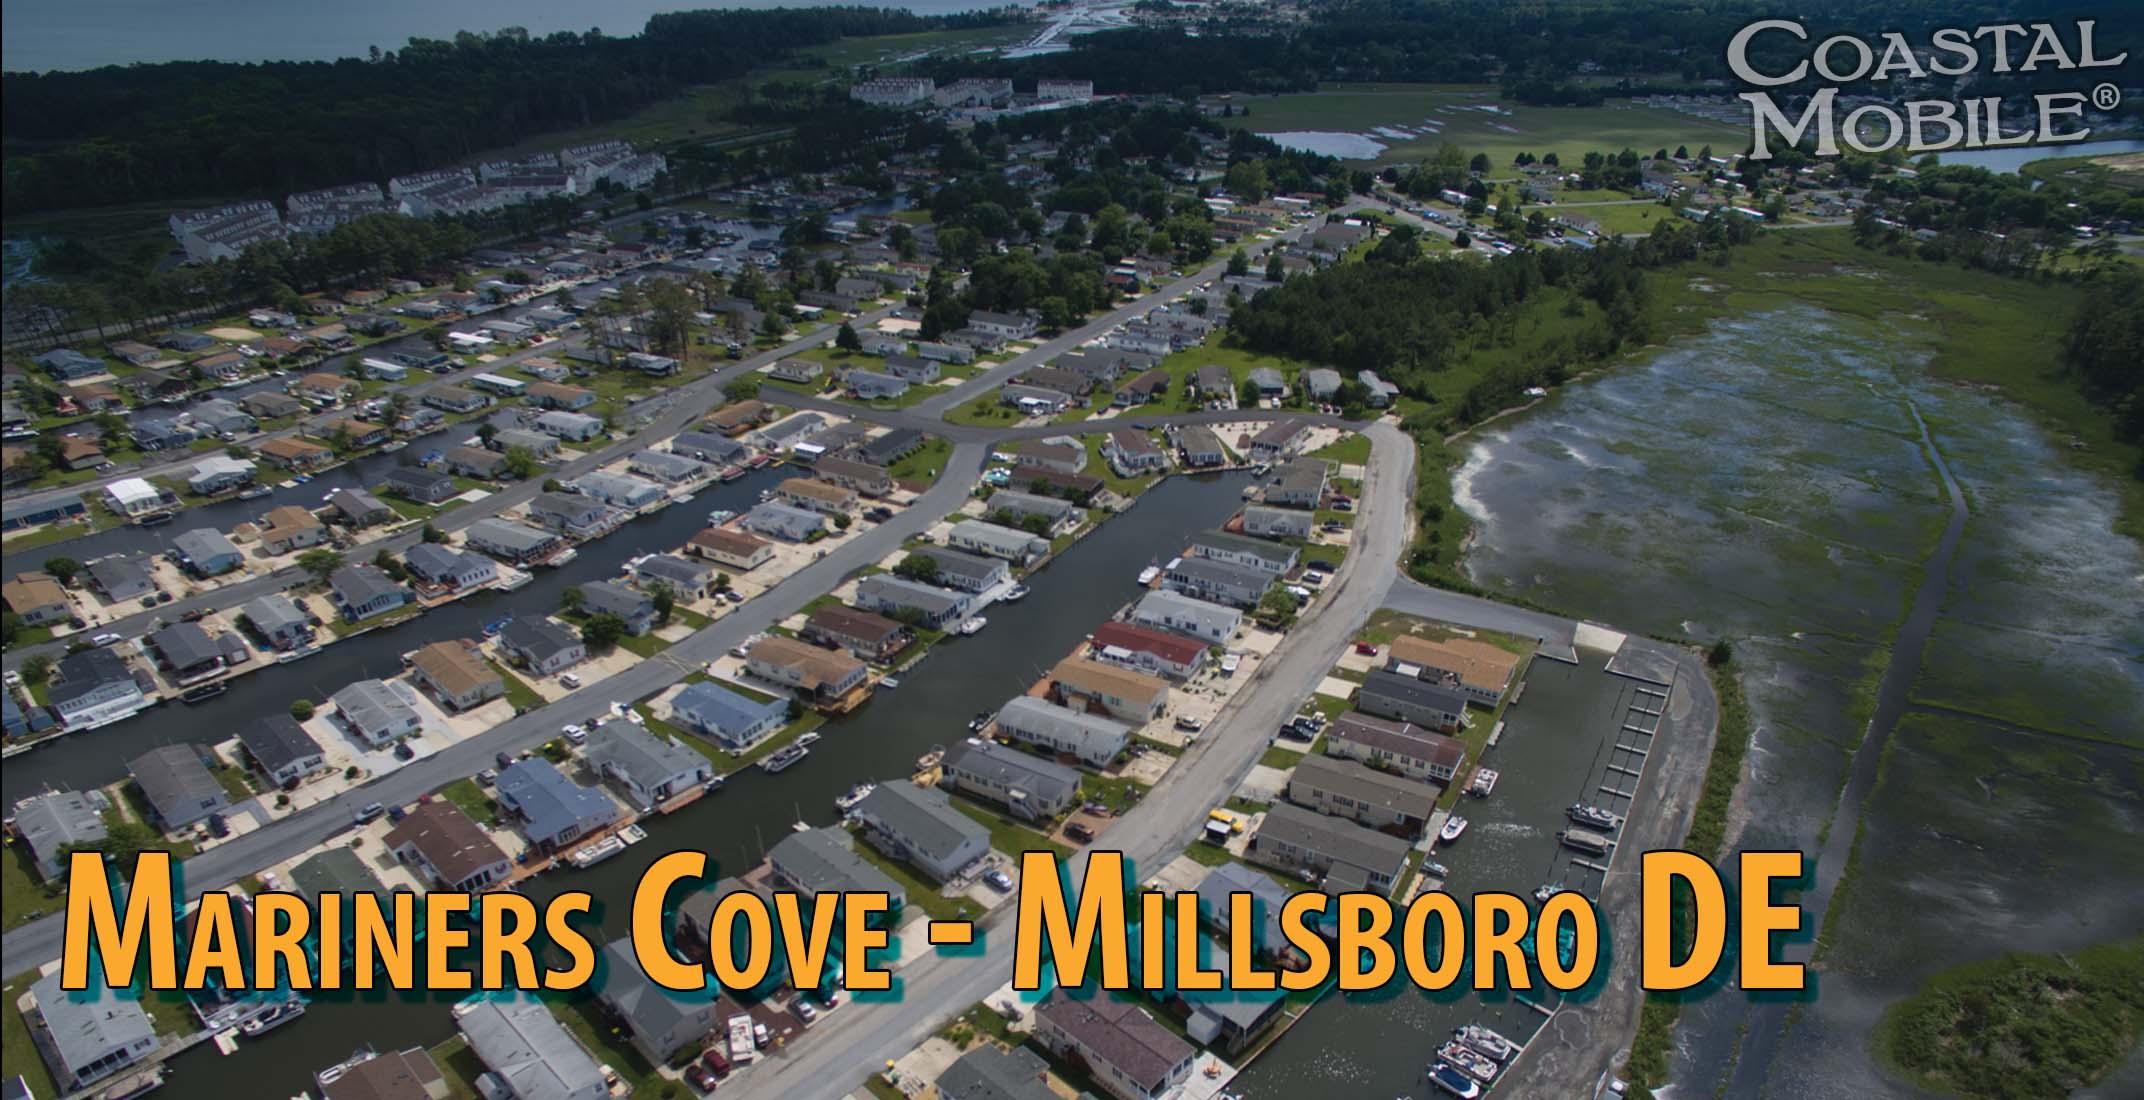 Mariners Cove Millsboro Delaware